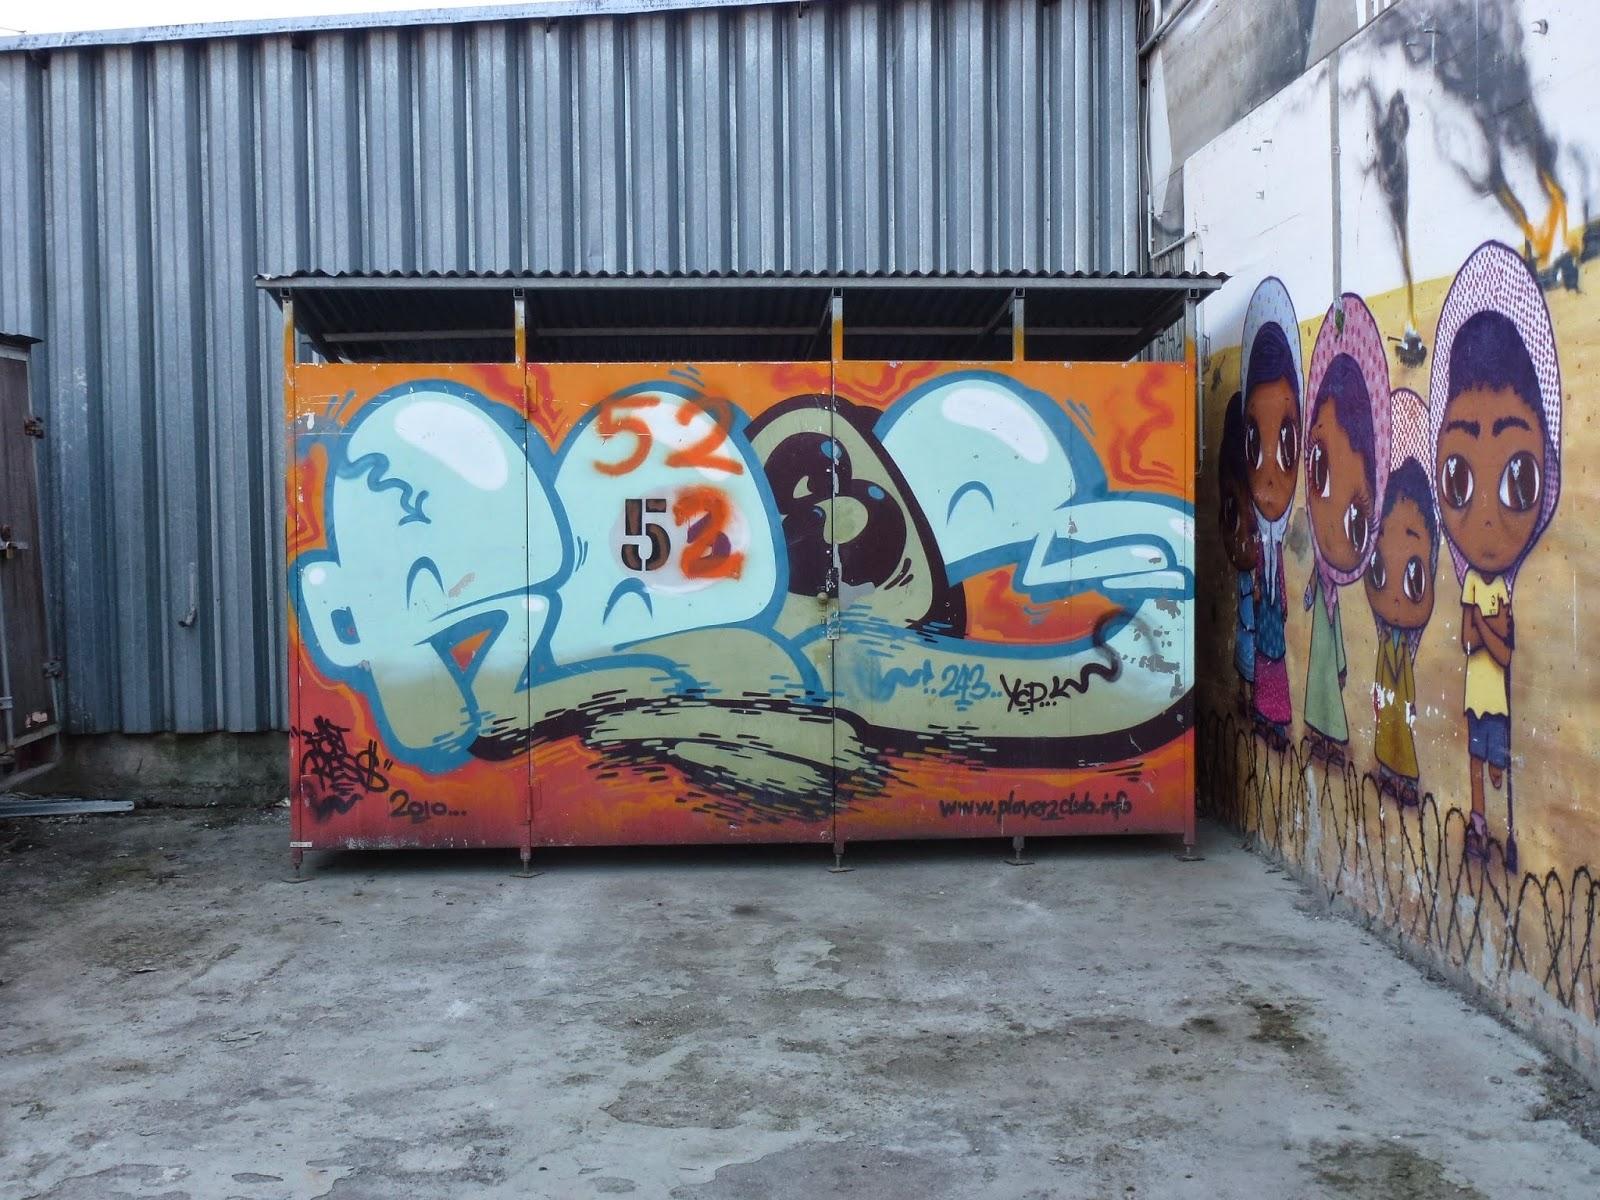 Graffiti, Streetart, Kunstpart Ost, München